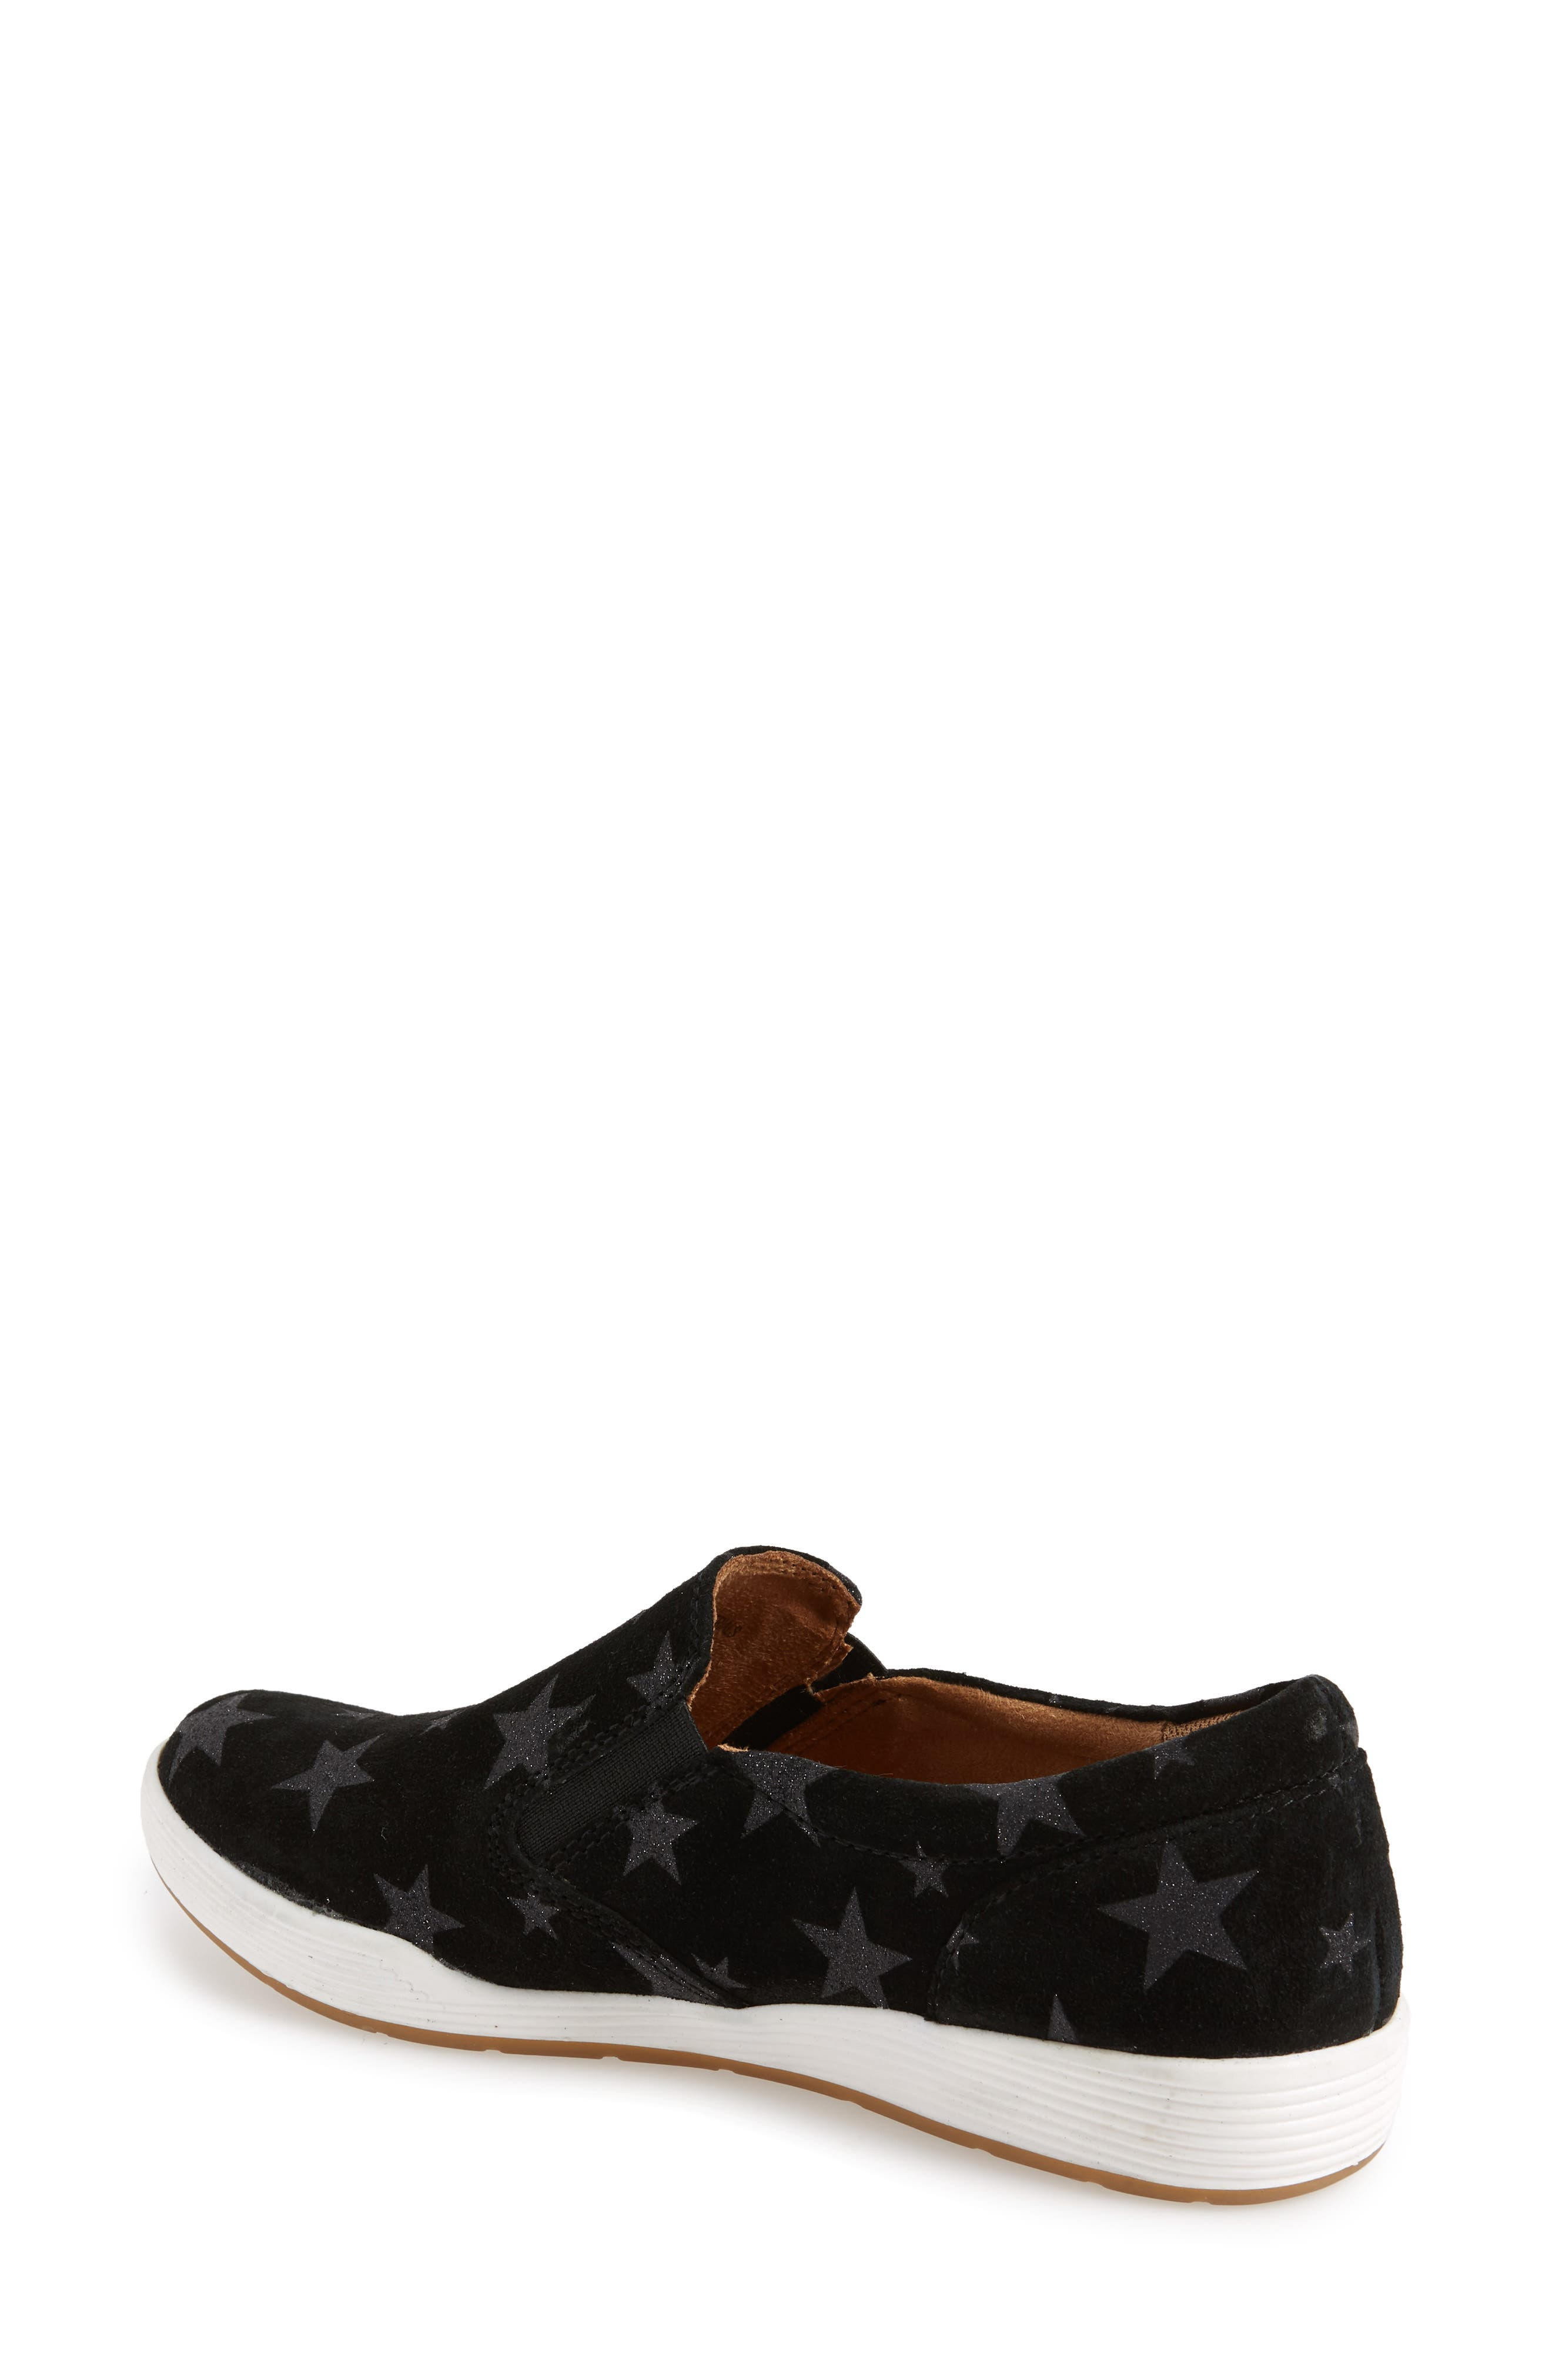 Linette Suede Slip-On Sneaker,                             Alternate thumbnail 2, color,                             BLACK SUEDE